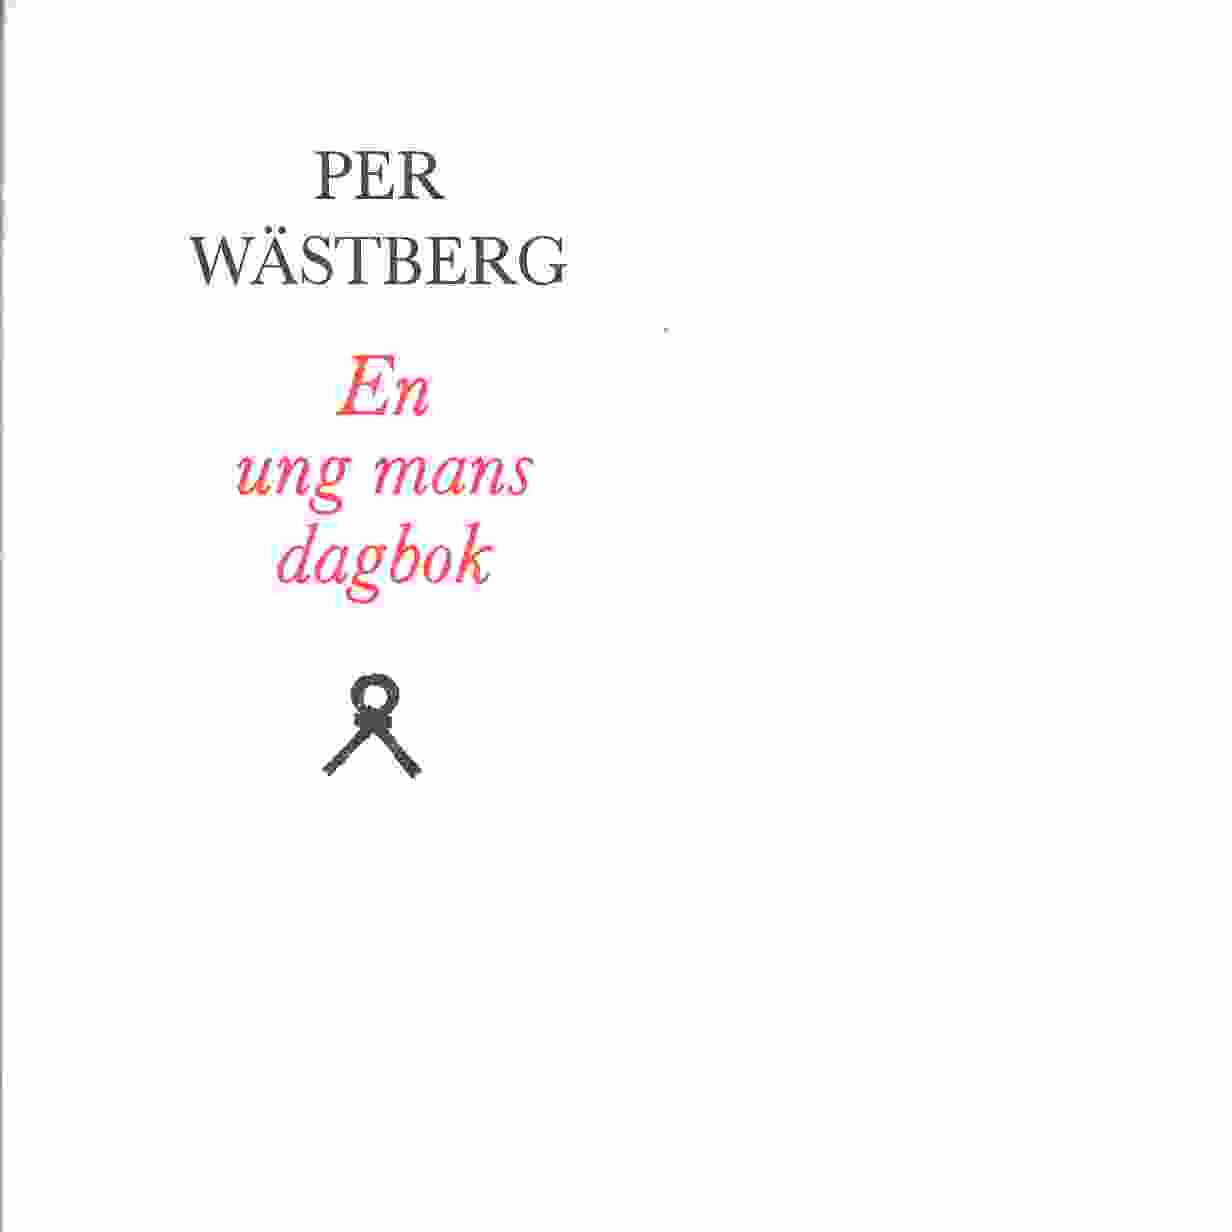 En ung mans dagbok - Wästberg, Per